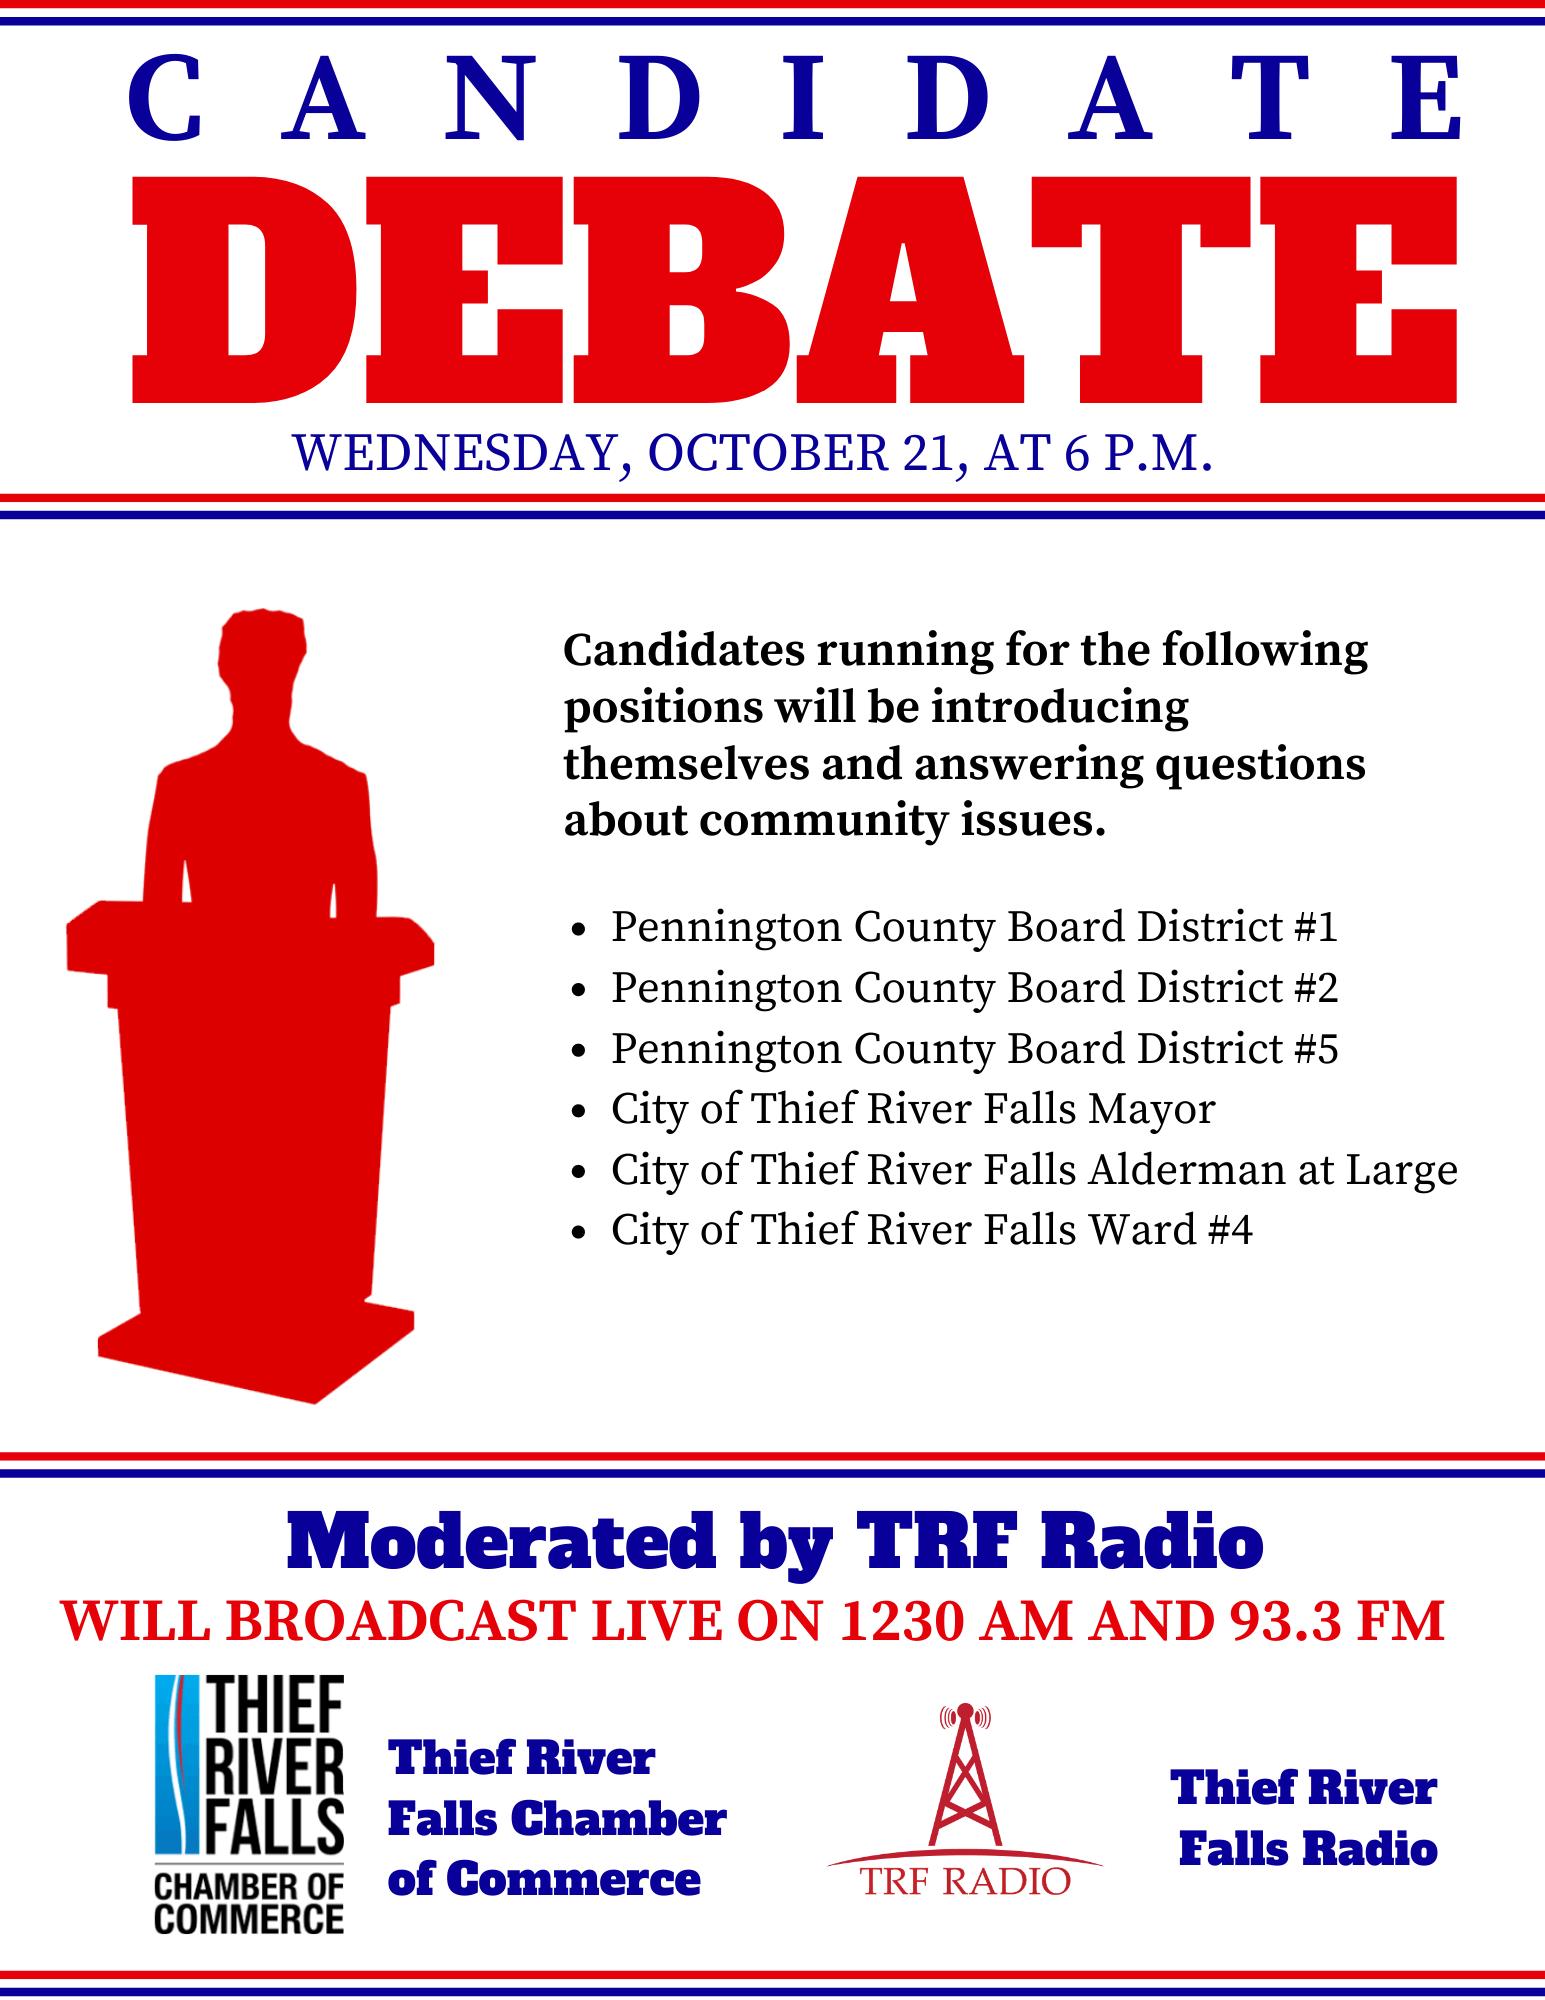 Candidate-Debate-Poster-2020.png